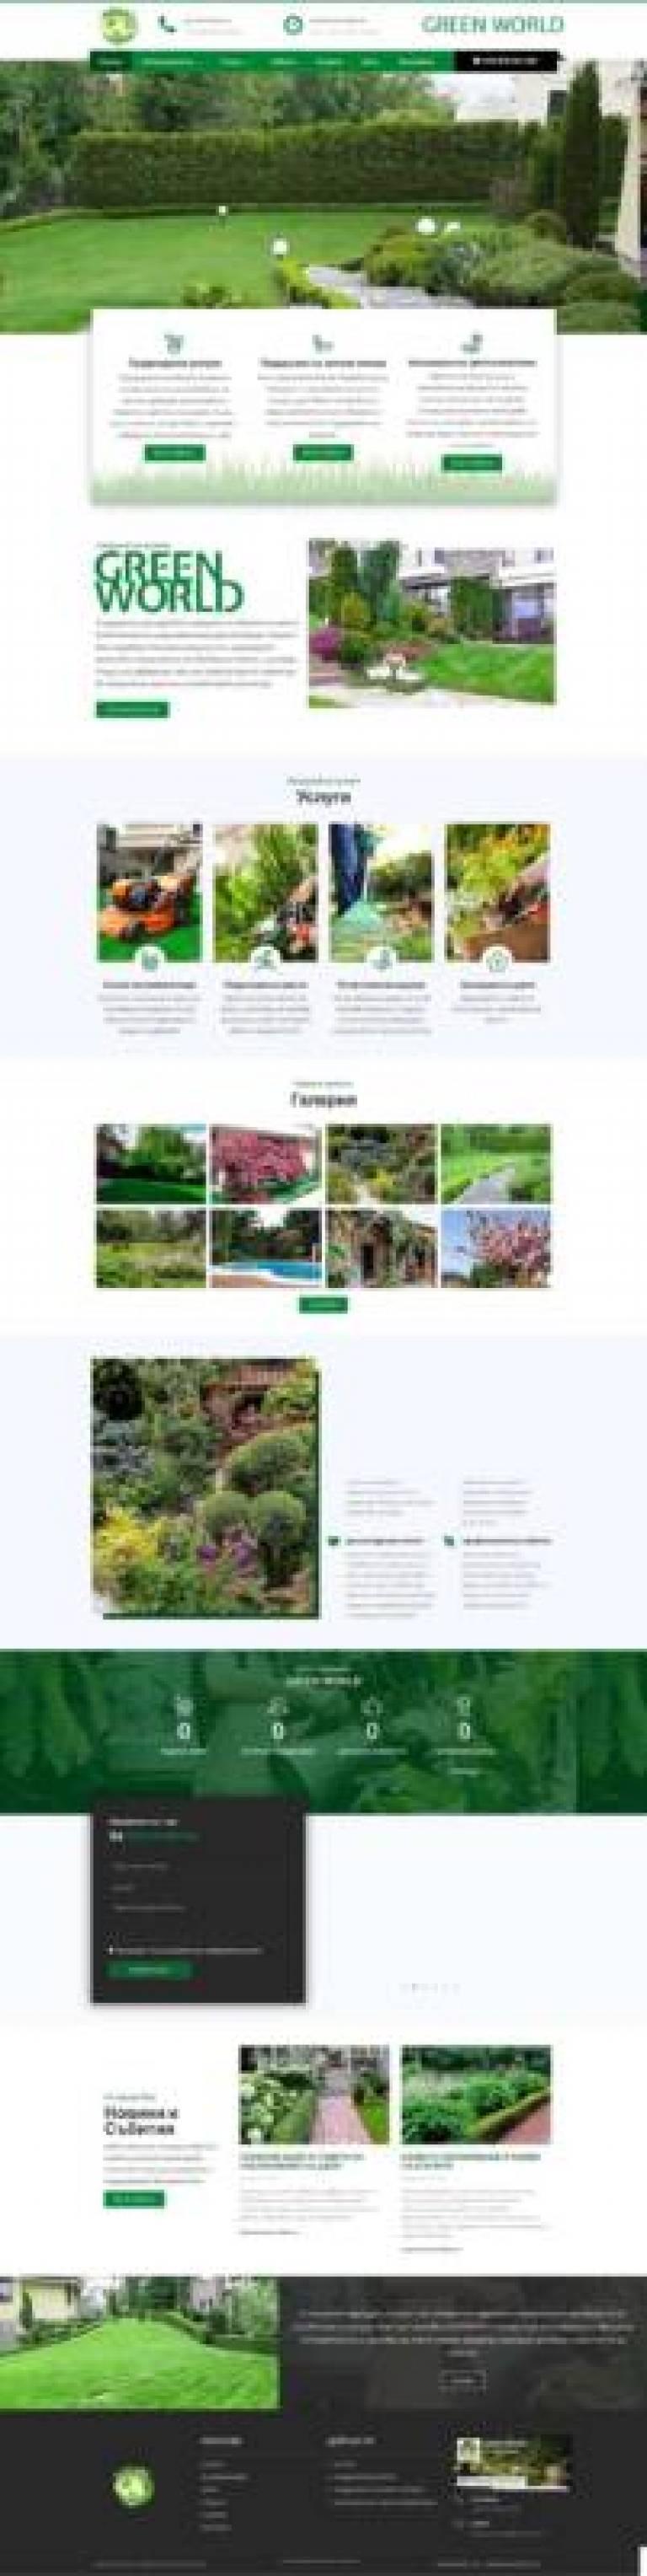 screencapture-greenworld-bg-eu-2019-06-20-17_26_51-min